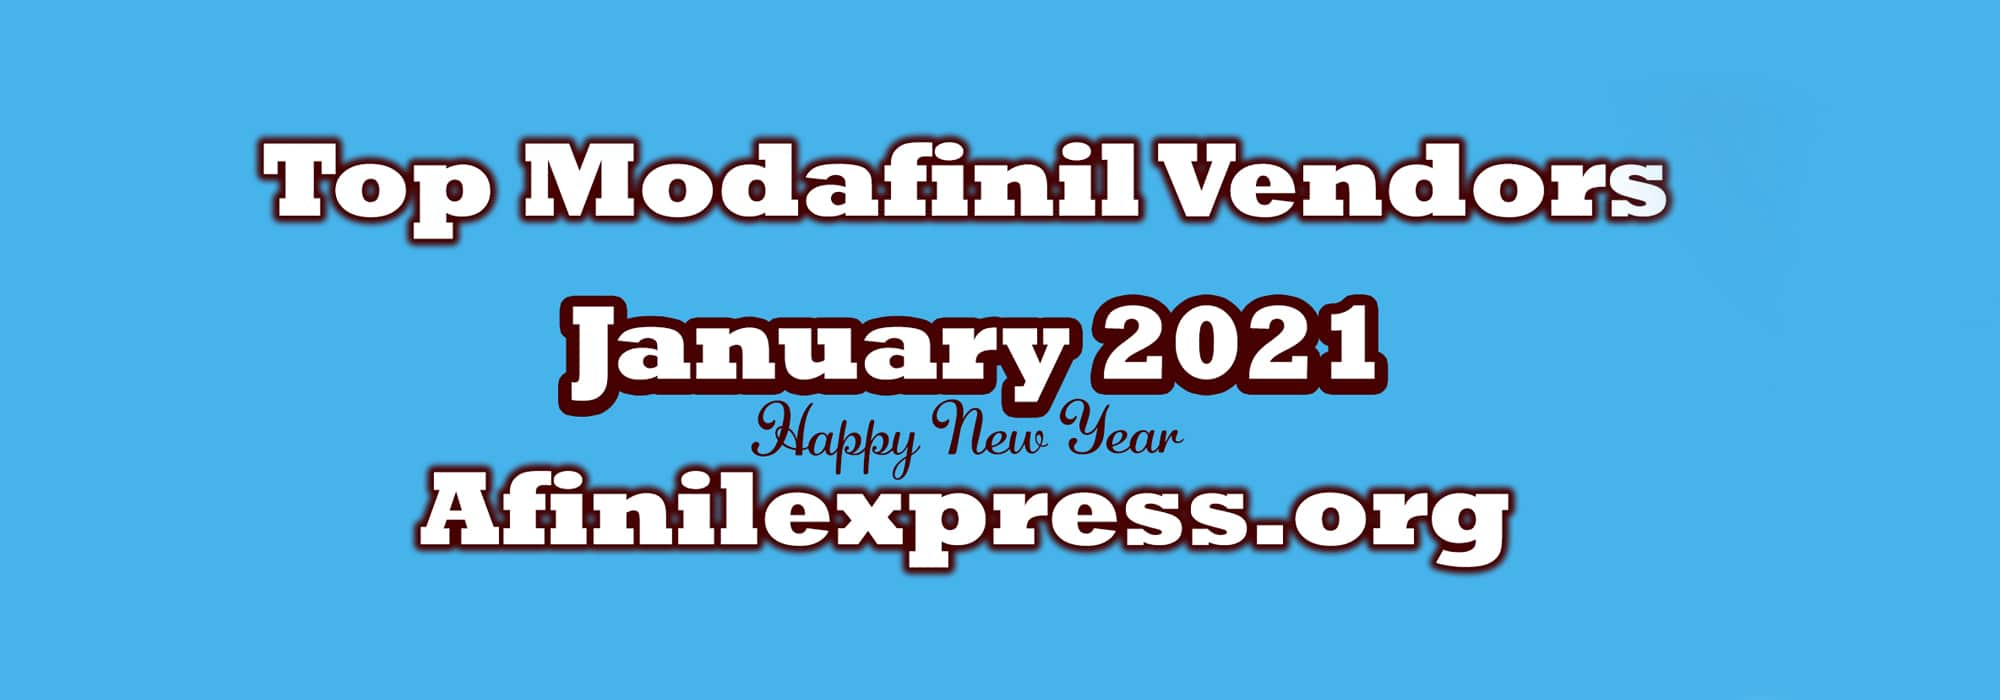 January 2021 Top Three Modafinil Vendors